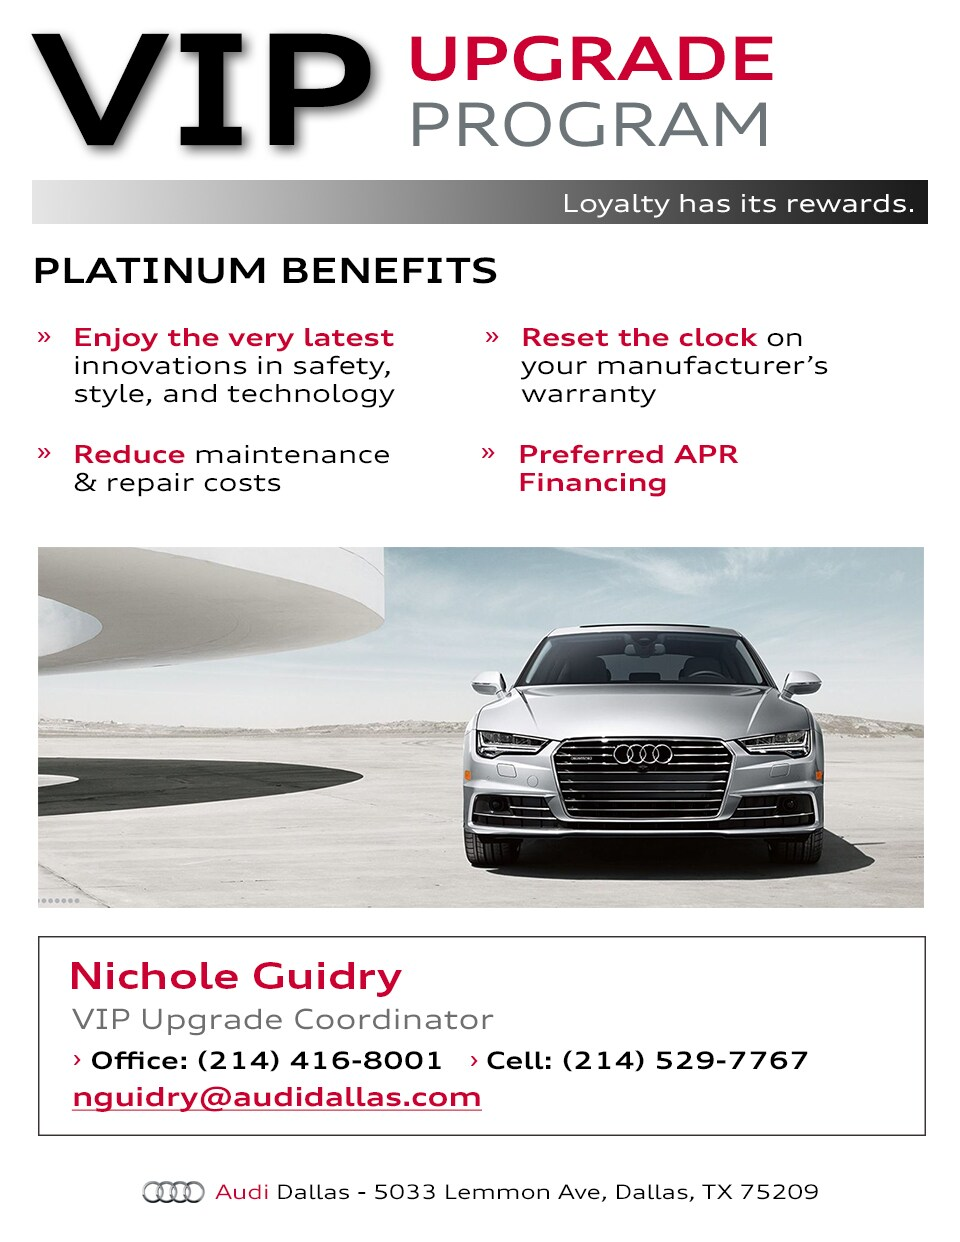 Audi Hoffman Estates New Audi Dealership In Hoffman